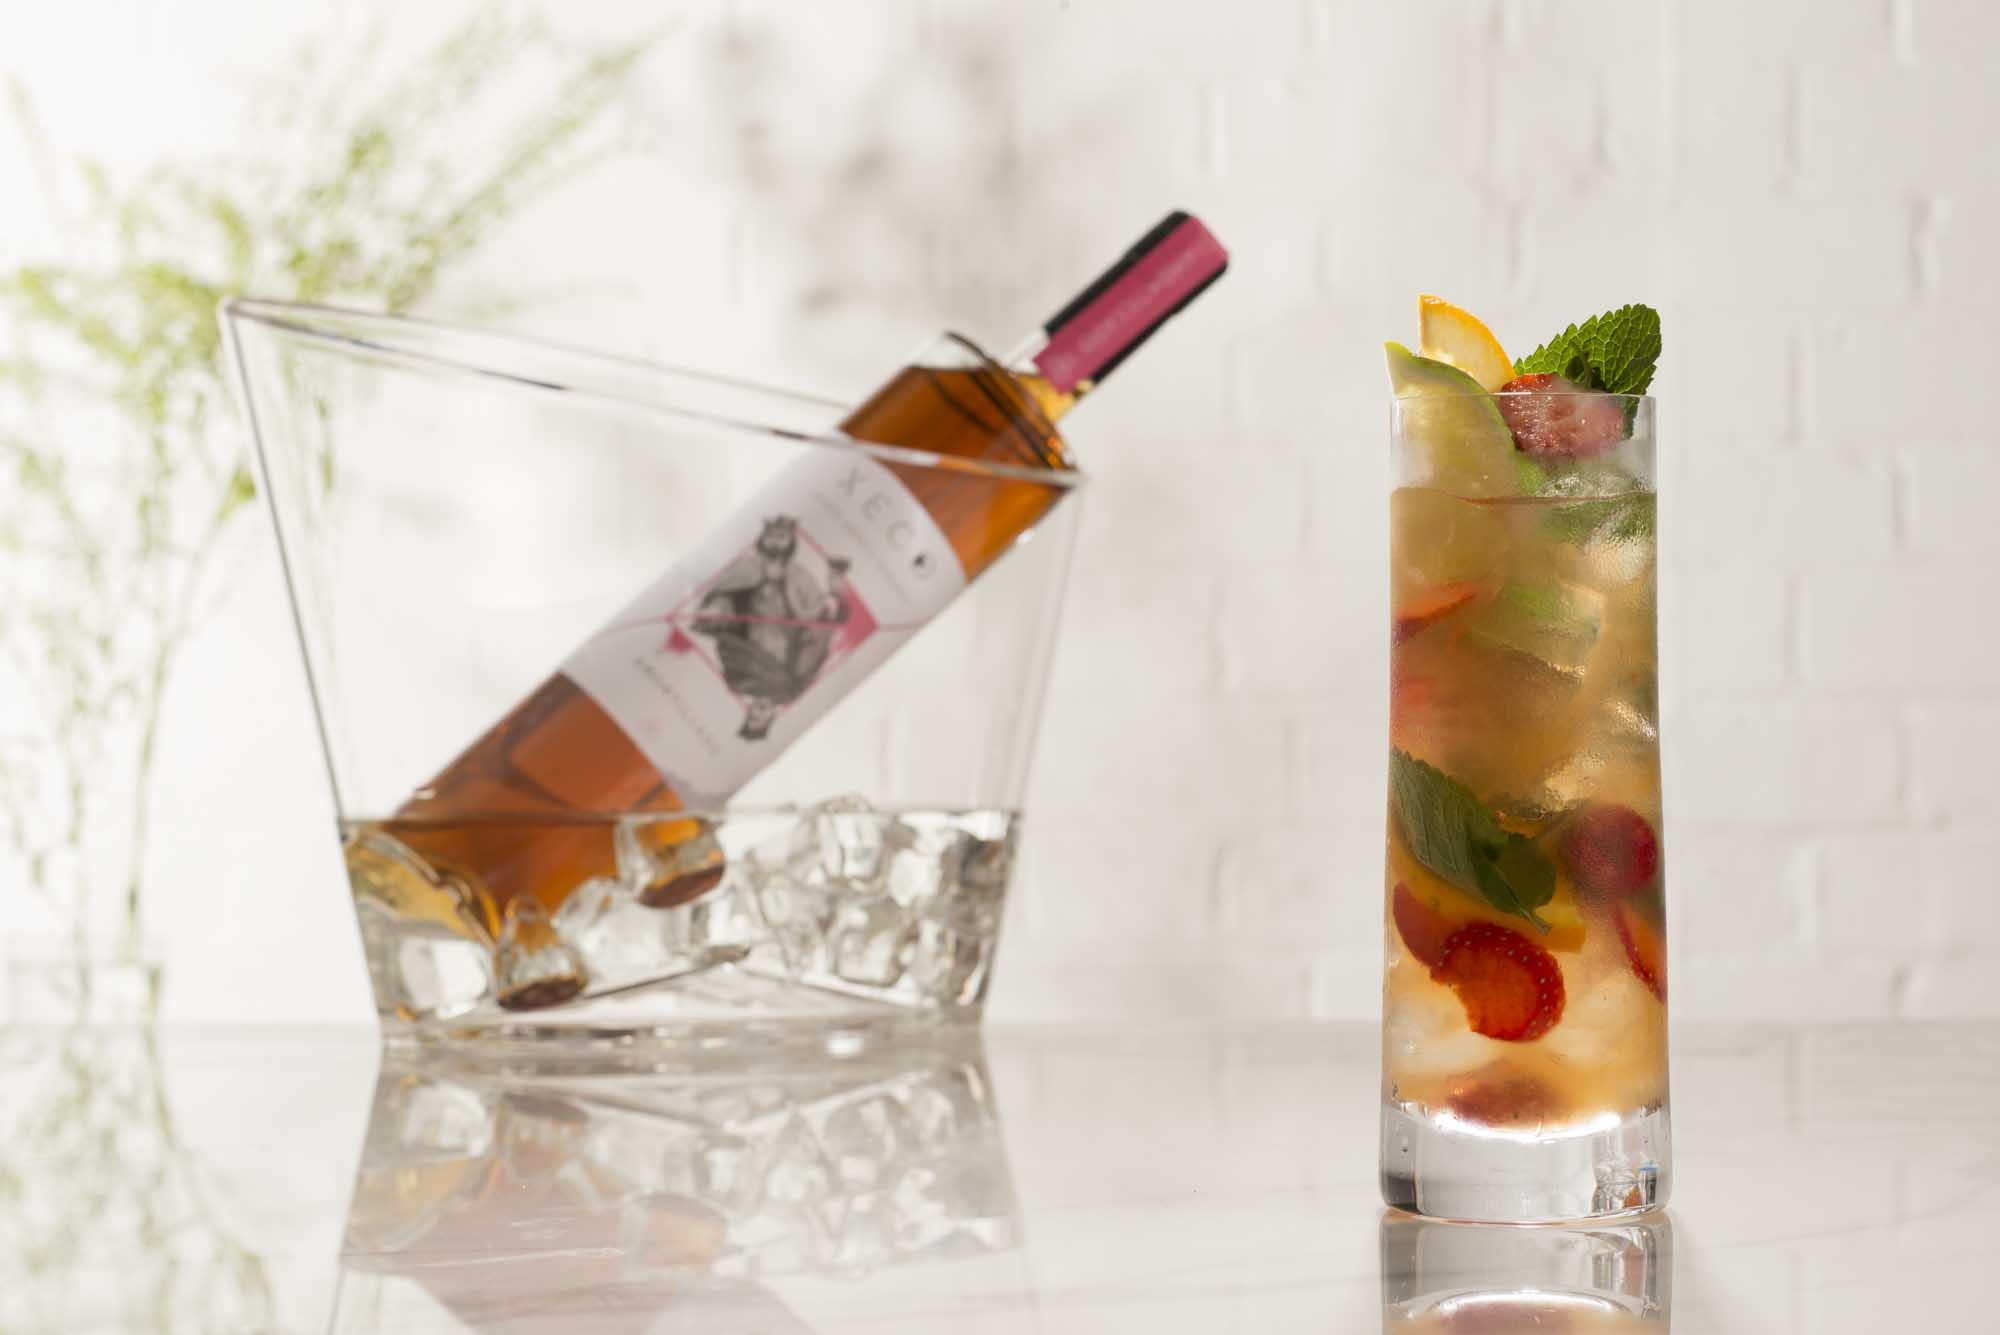 MONTI COBBLER - Amontillado sherry, seasonal fruits, lime, an optional dash of soda.